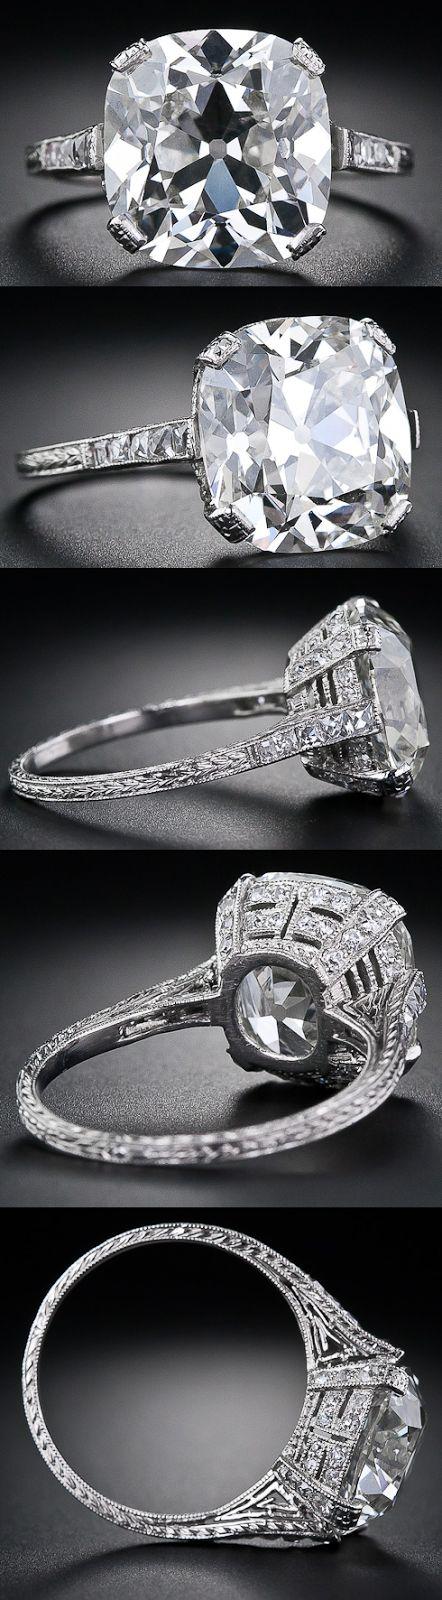 Multi-view: 6.48 carat antique cushion cut diamond ring. Via Diamonds in the Library.